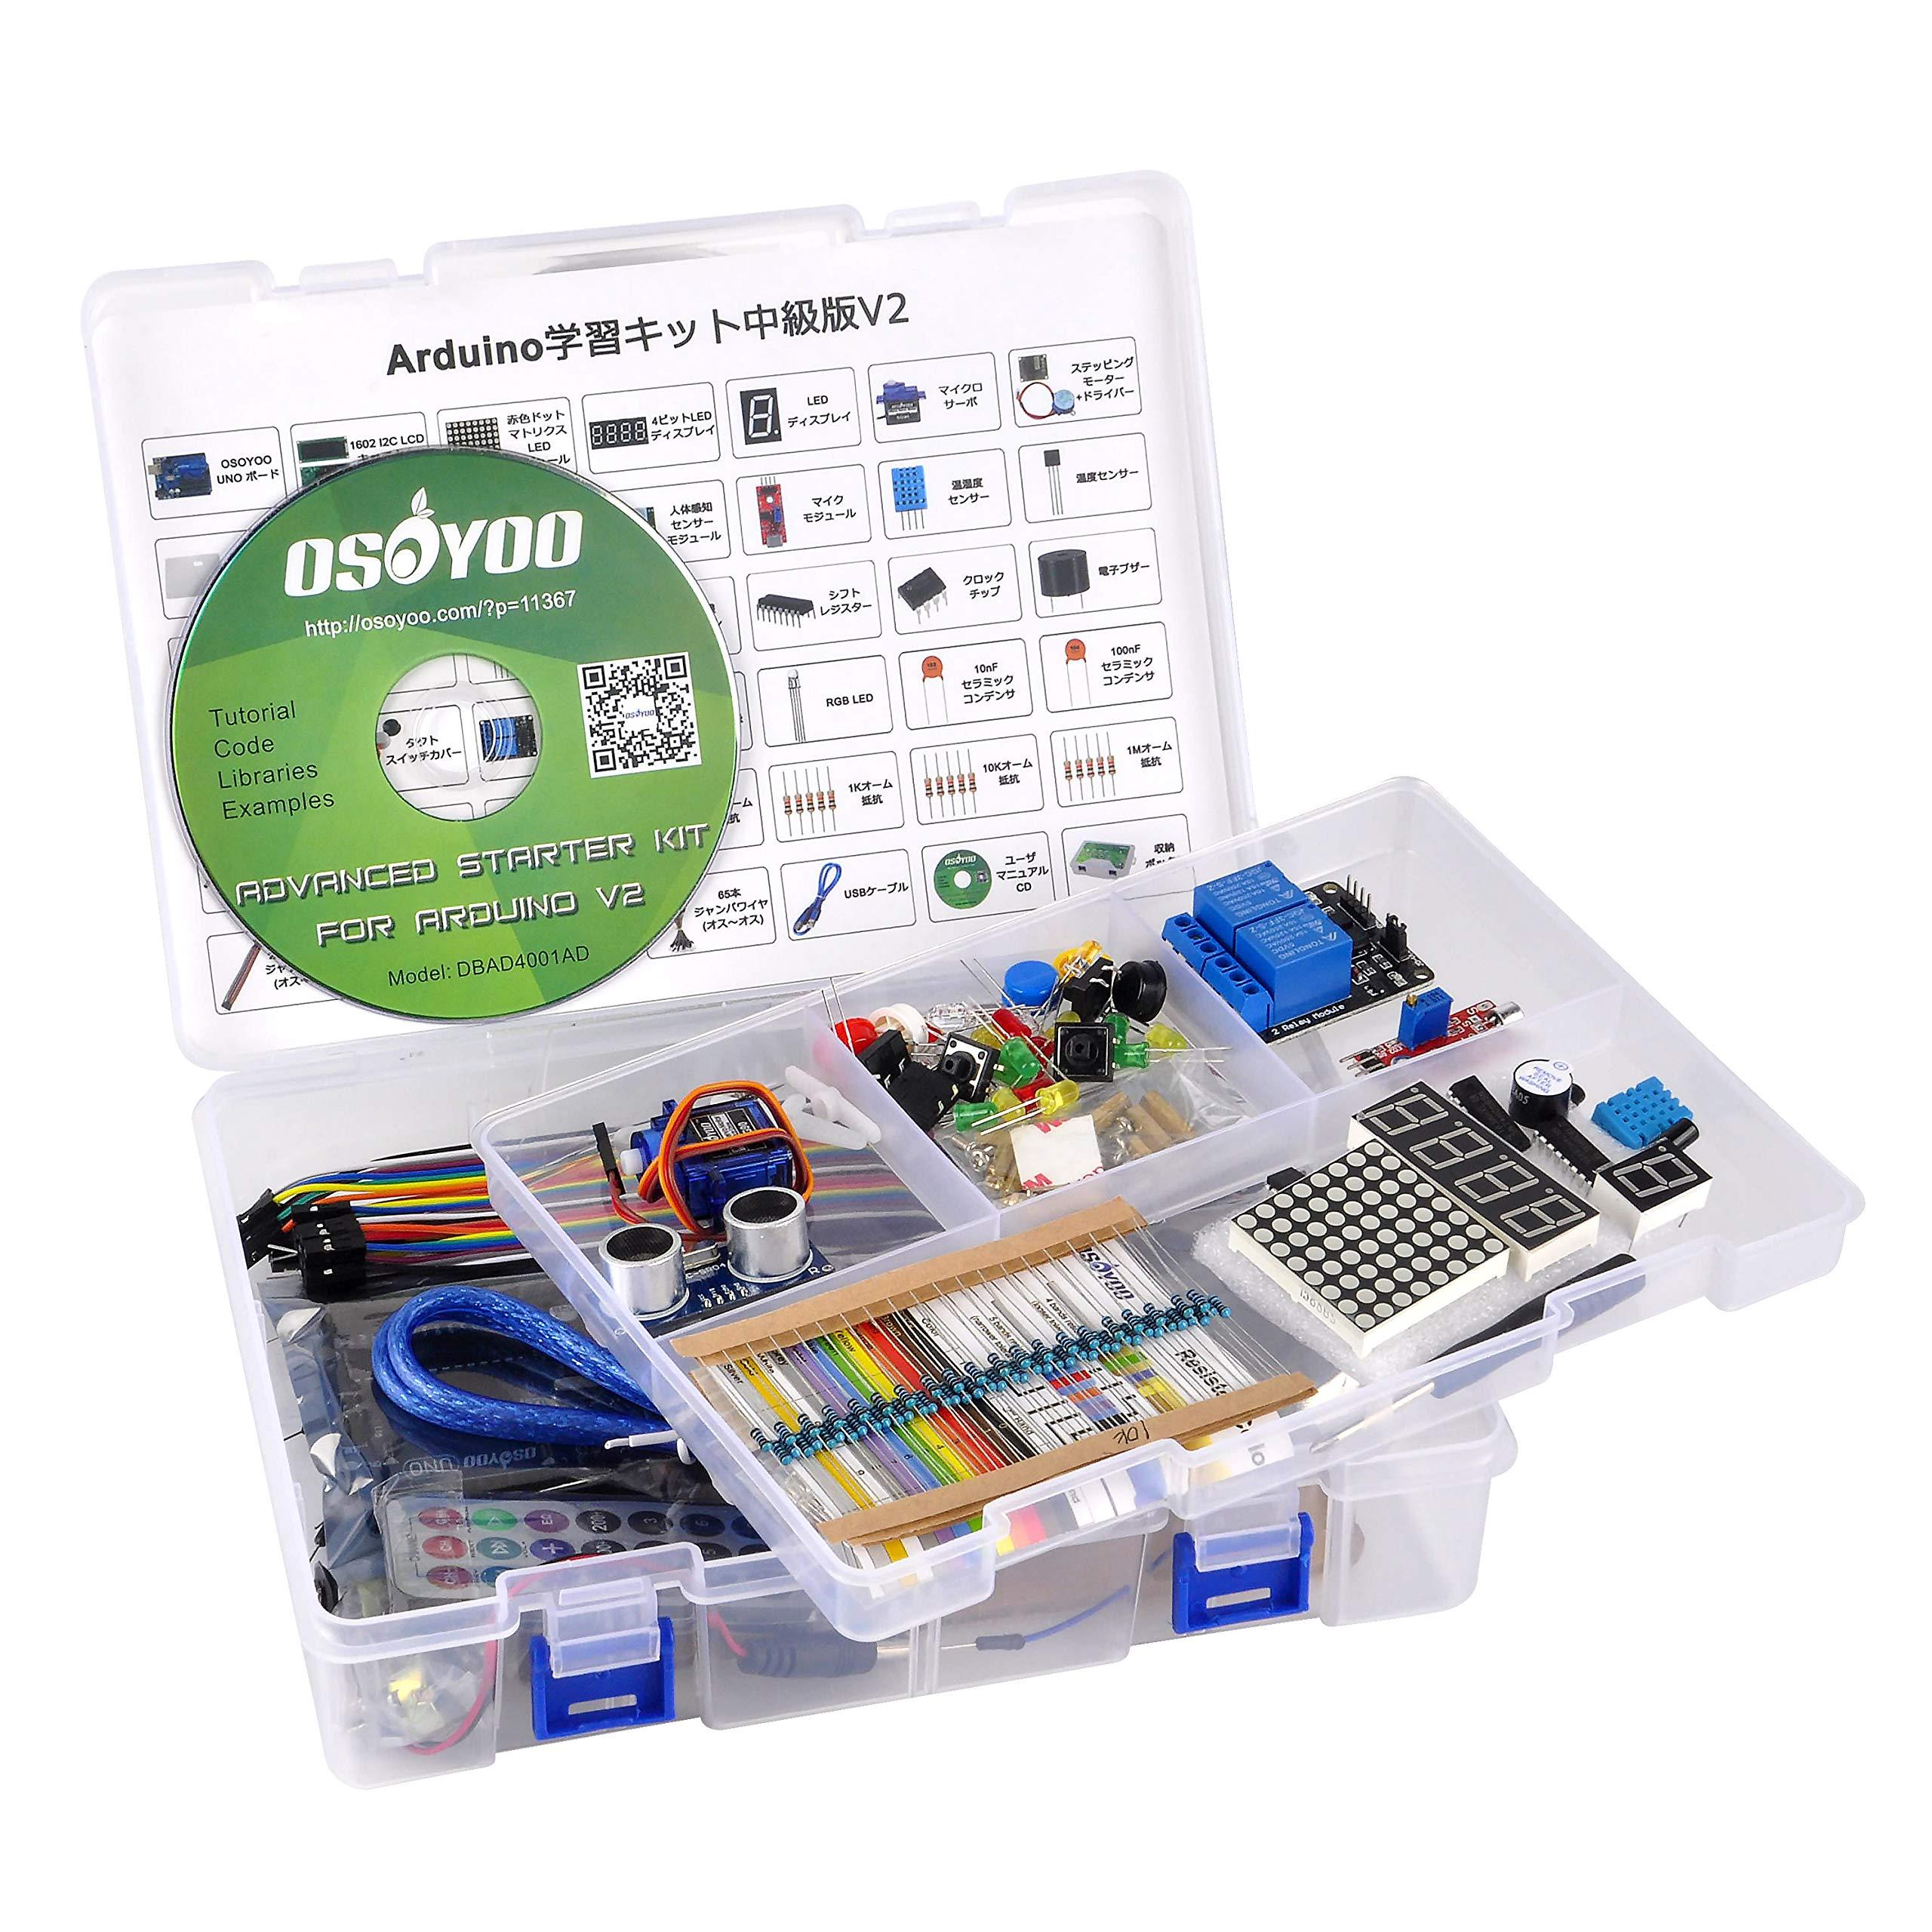 Arduino Uno R3 Kit KOOKYE (1EUW843I)